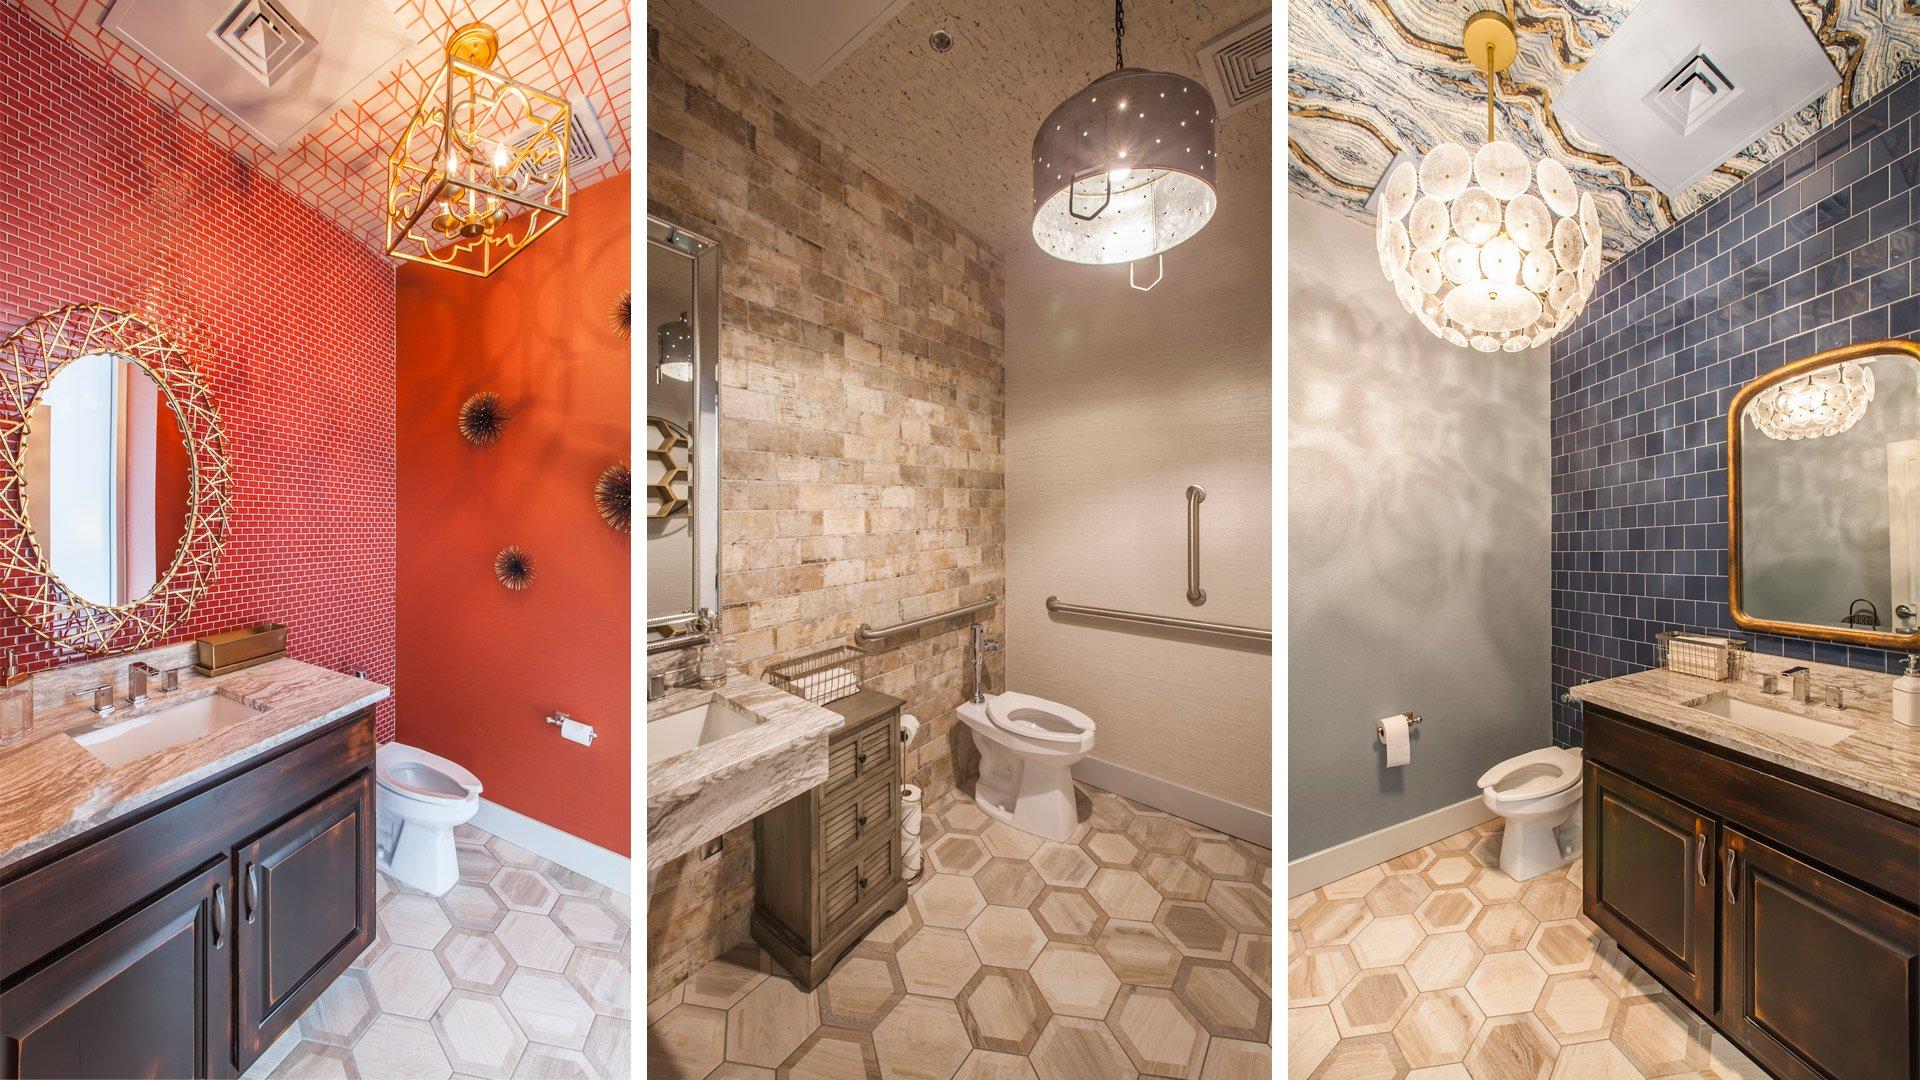 Jianna, Modern Italian + Oyster Bar, Bathrooms